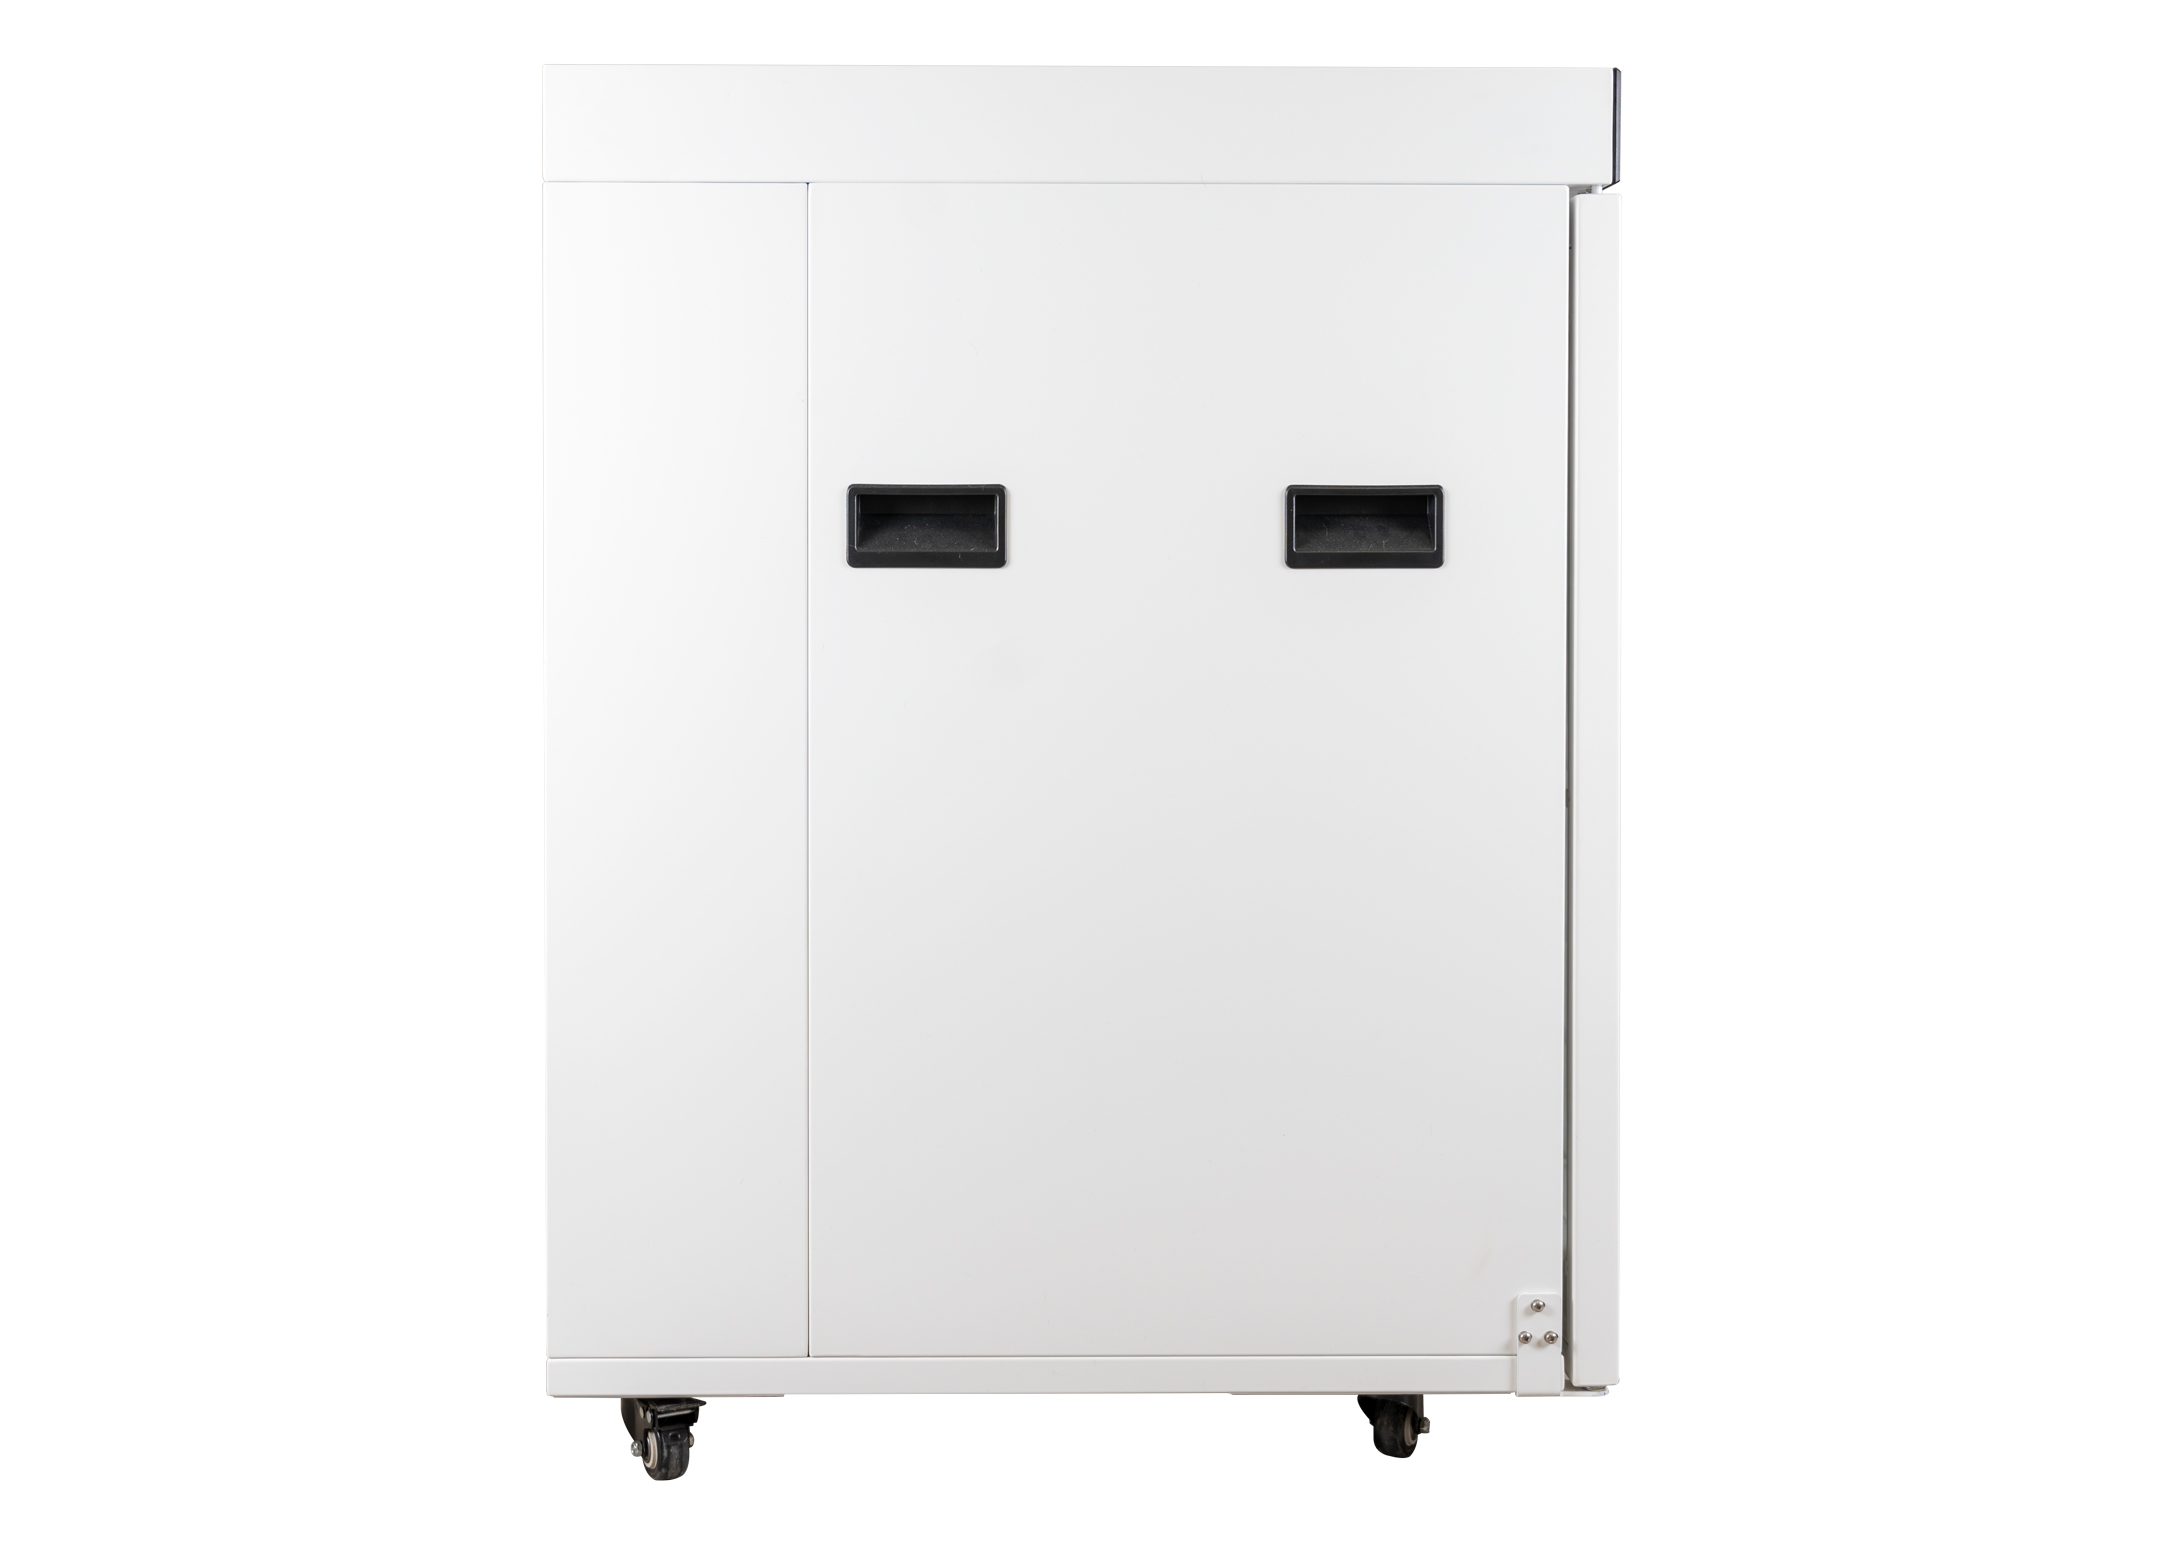 Groom-X Professional Cabin Dryer XL